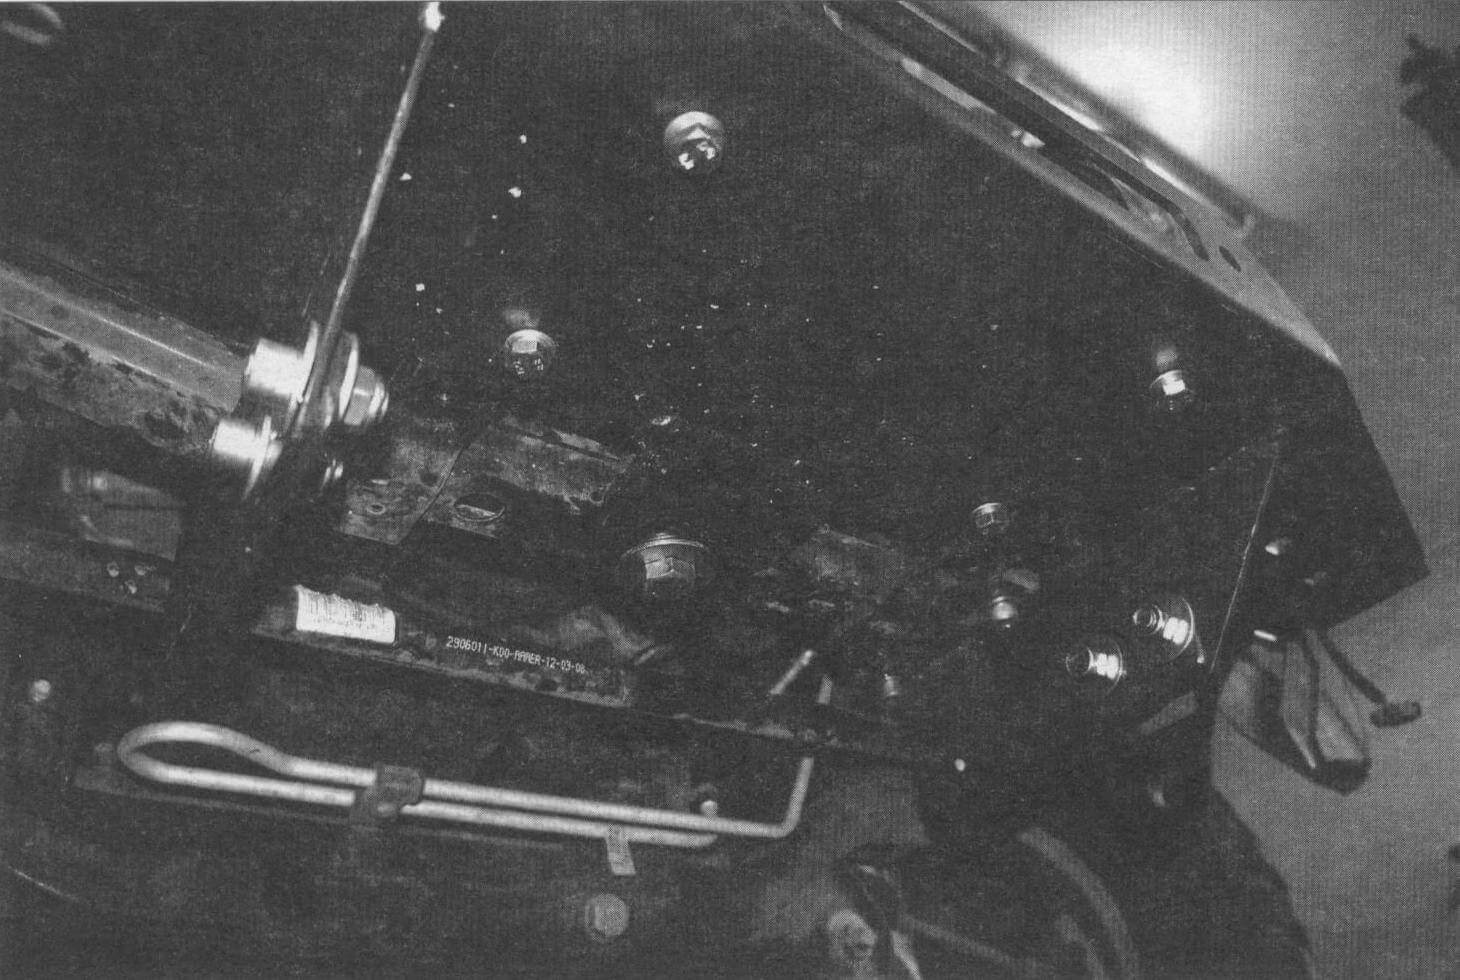 Вид на опорную площадку лебедки снизу. Она установлена вместо демонтированного усилителя бампера, взяв на себя его функции